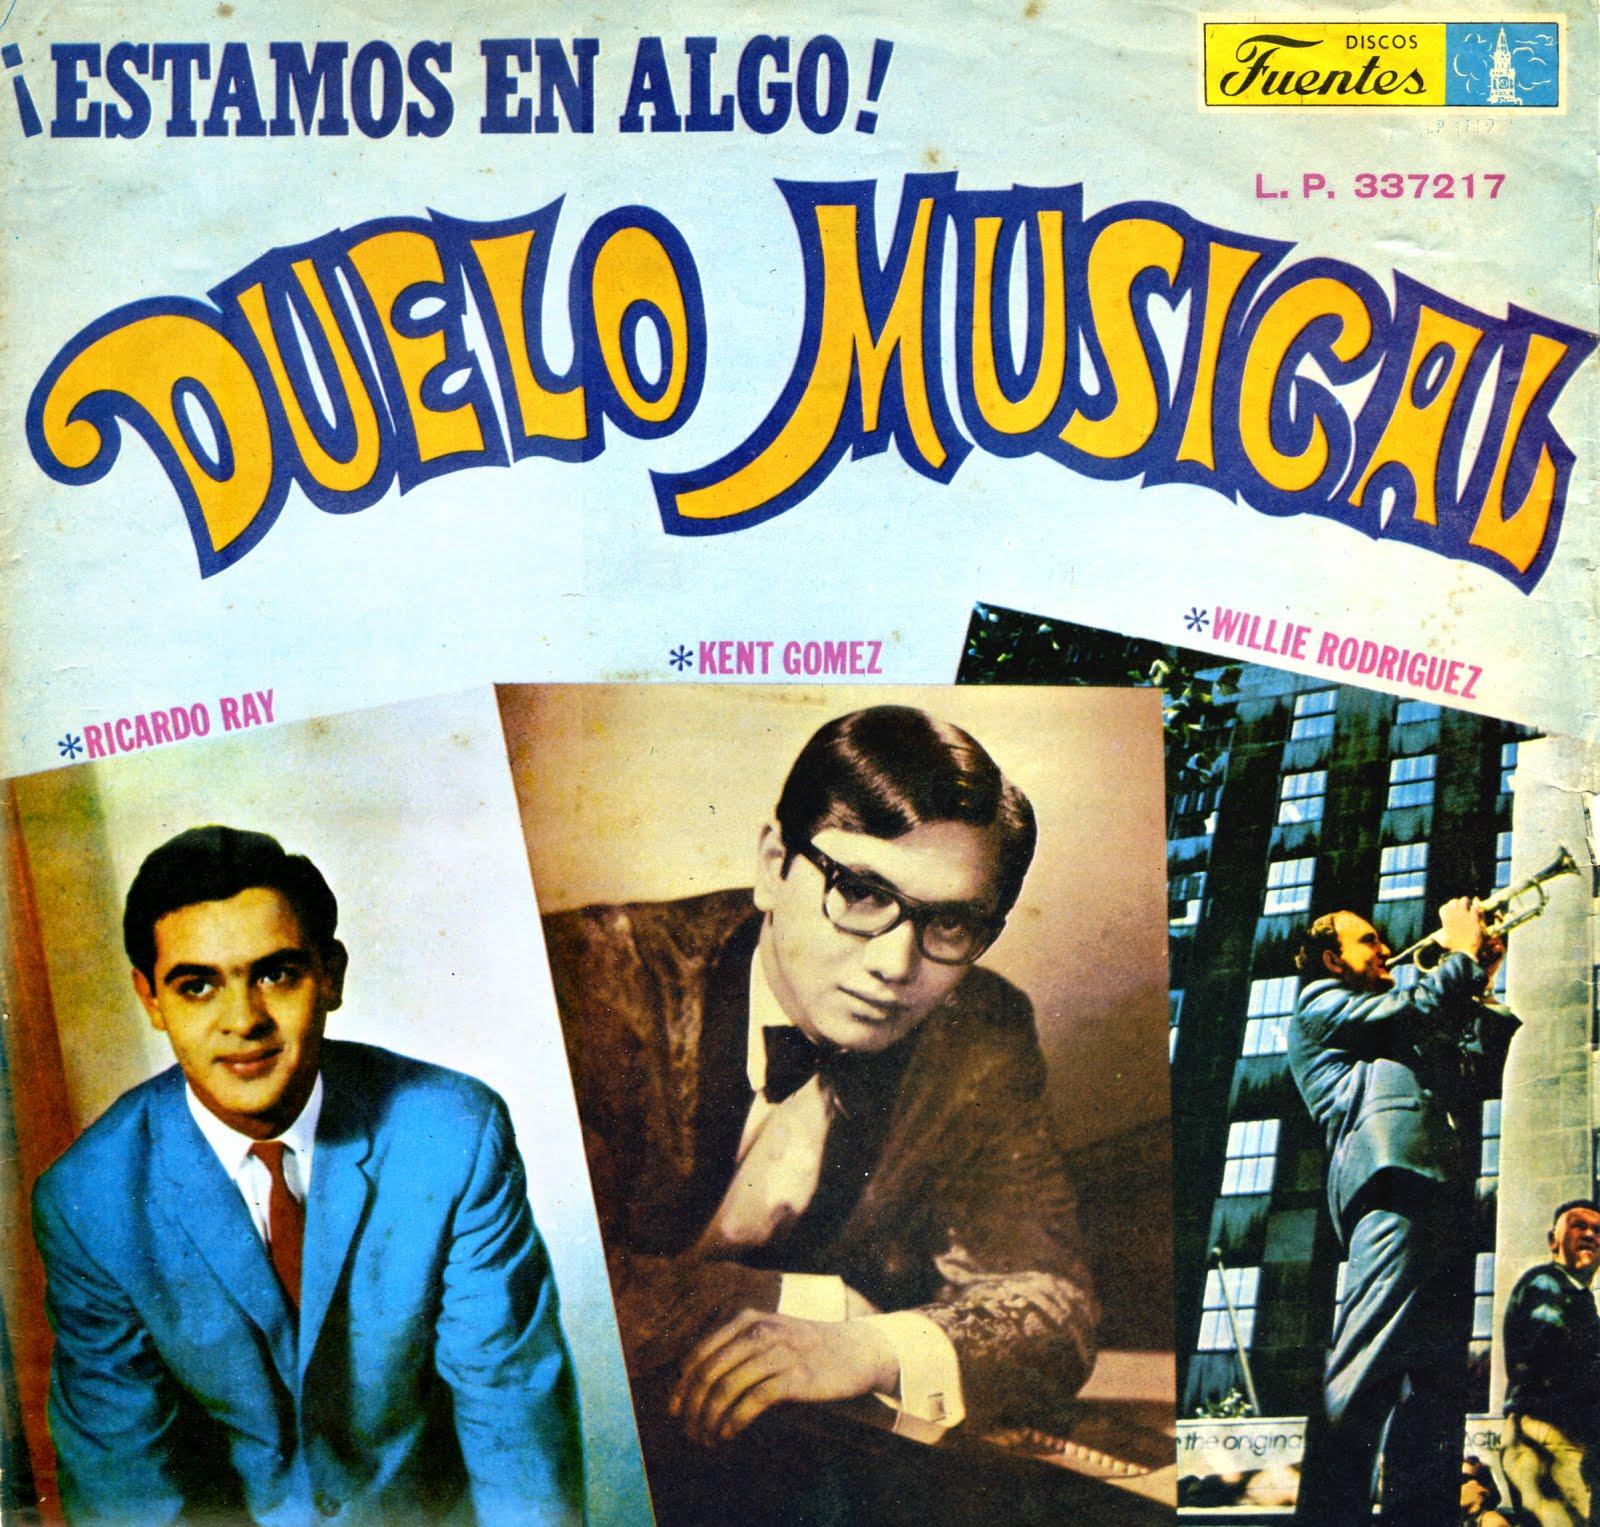 El Cubano - Go-Go Mueve-Mueve